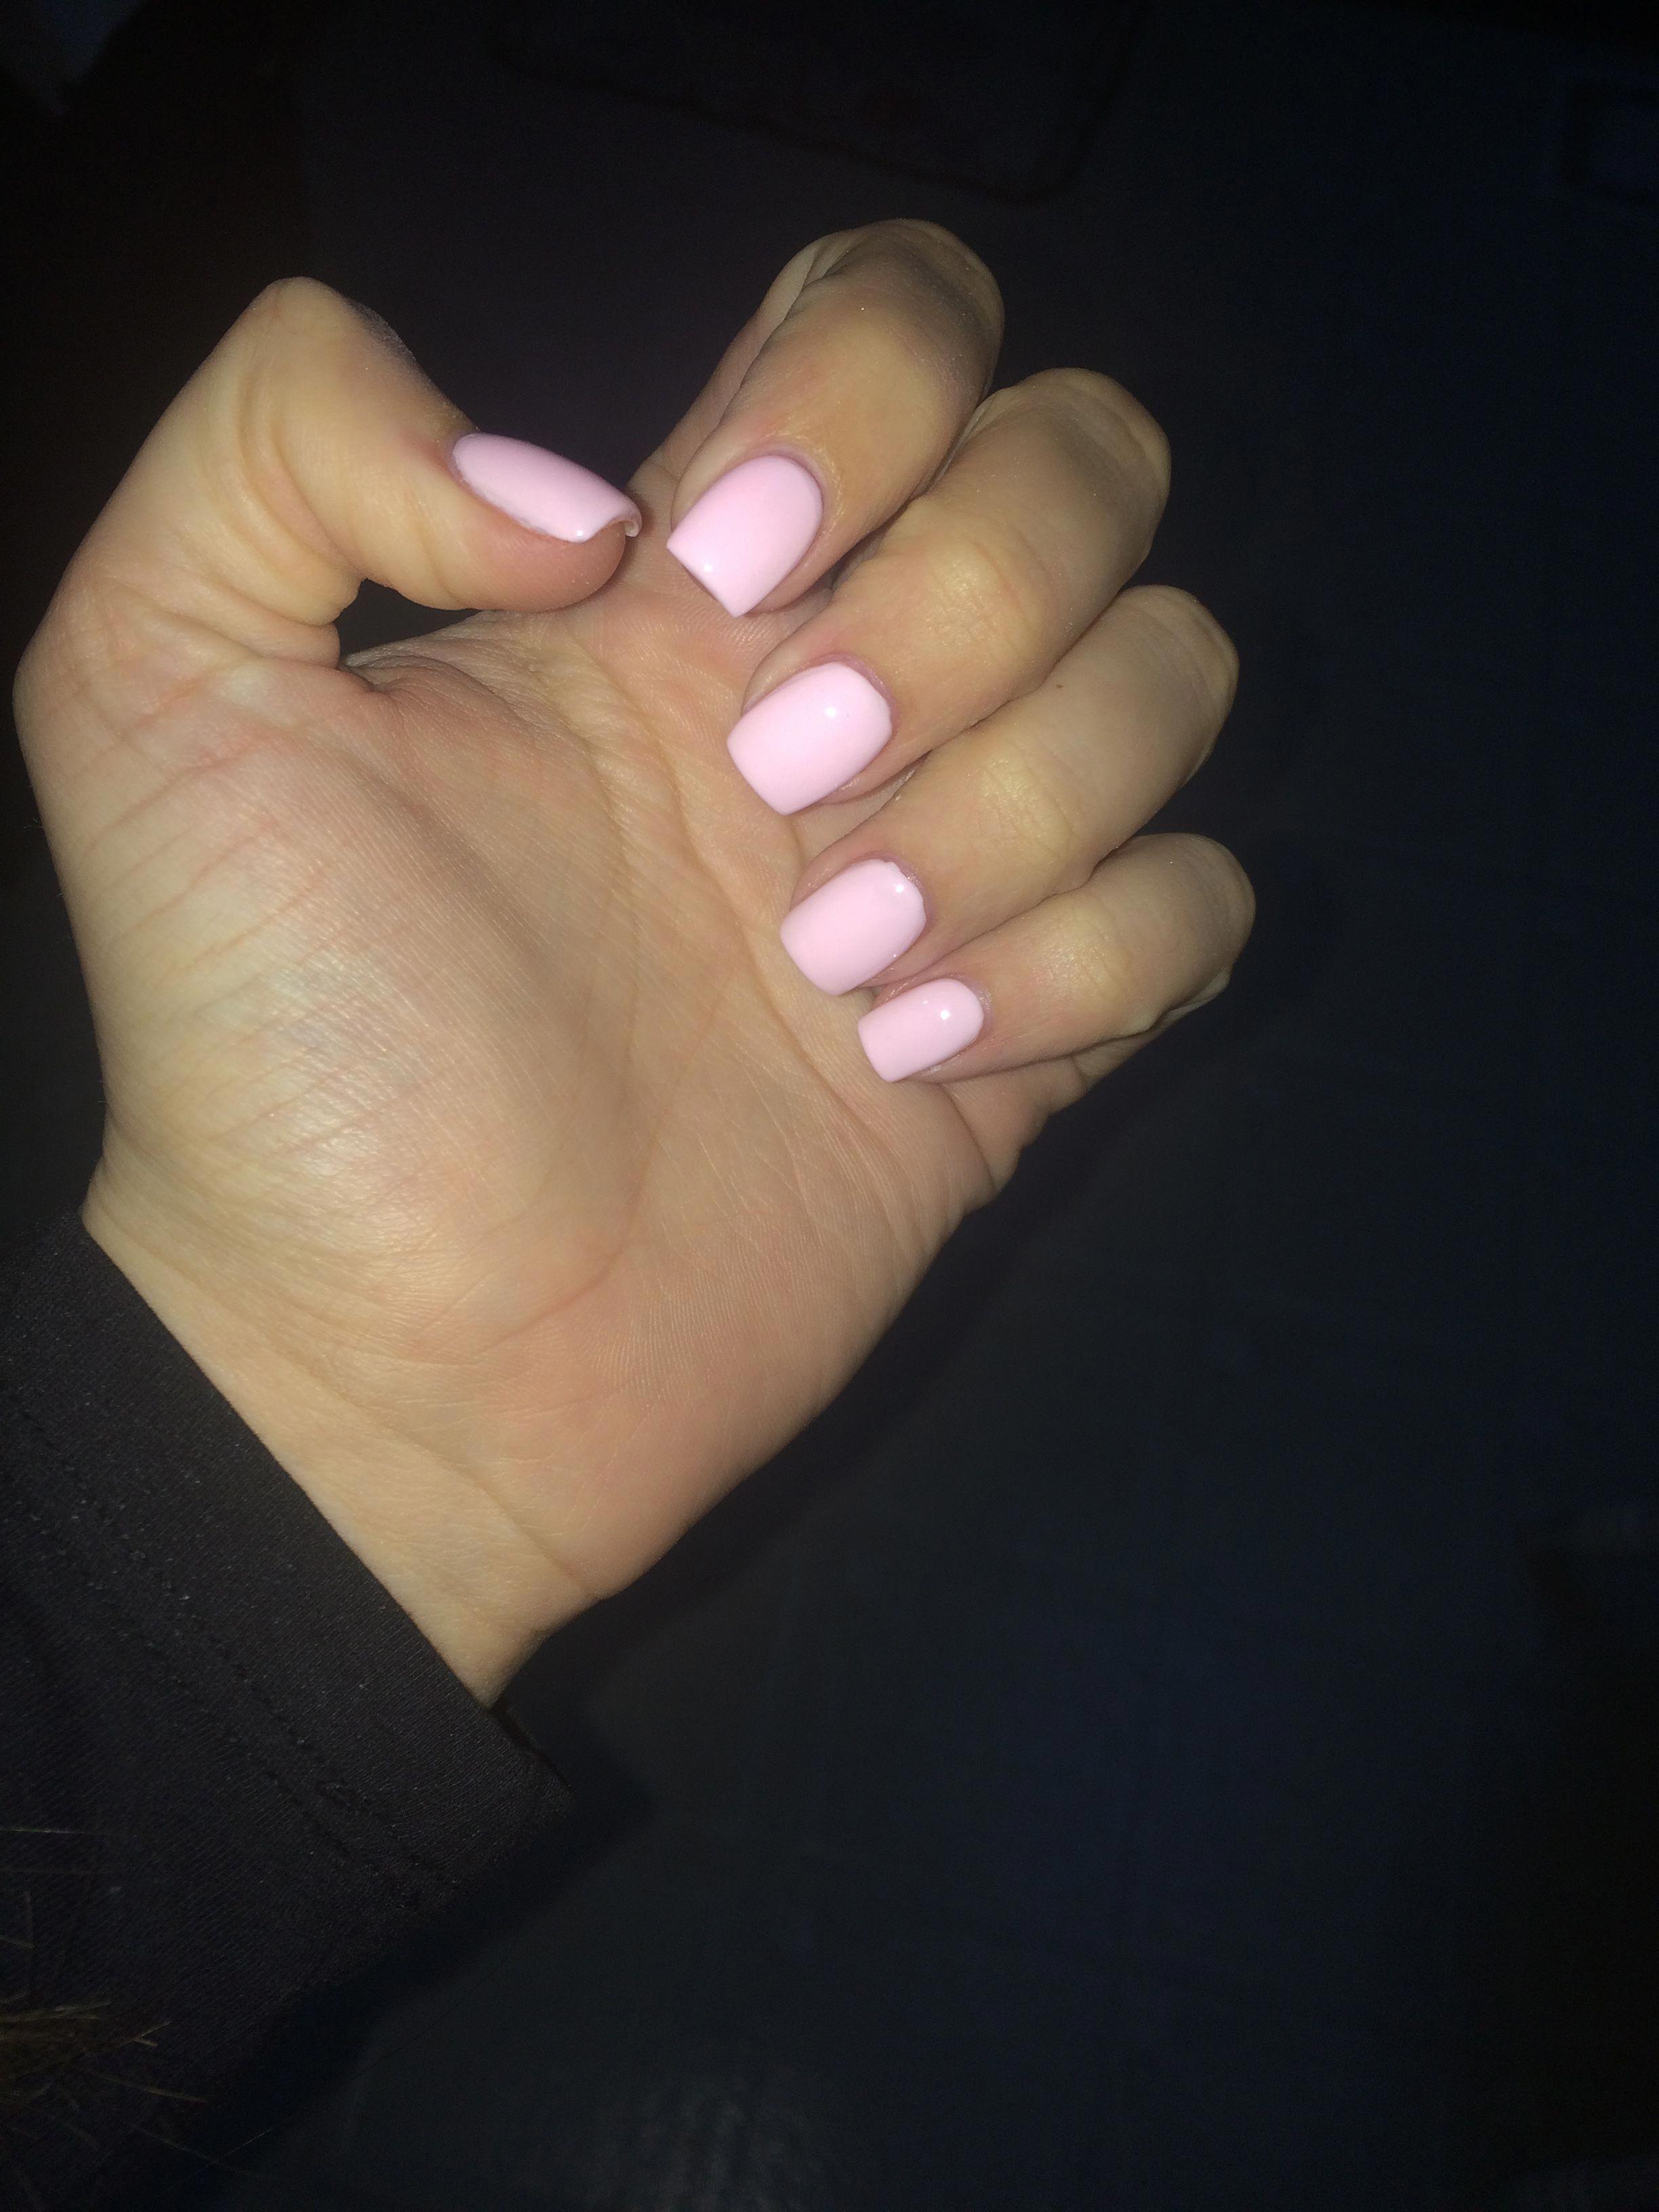 Pink Acrylic Small Square Nails Beautifulacrylicnails Square Acrylic Nails Short Square Acrylic Nails Pink Acrylic Nails